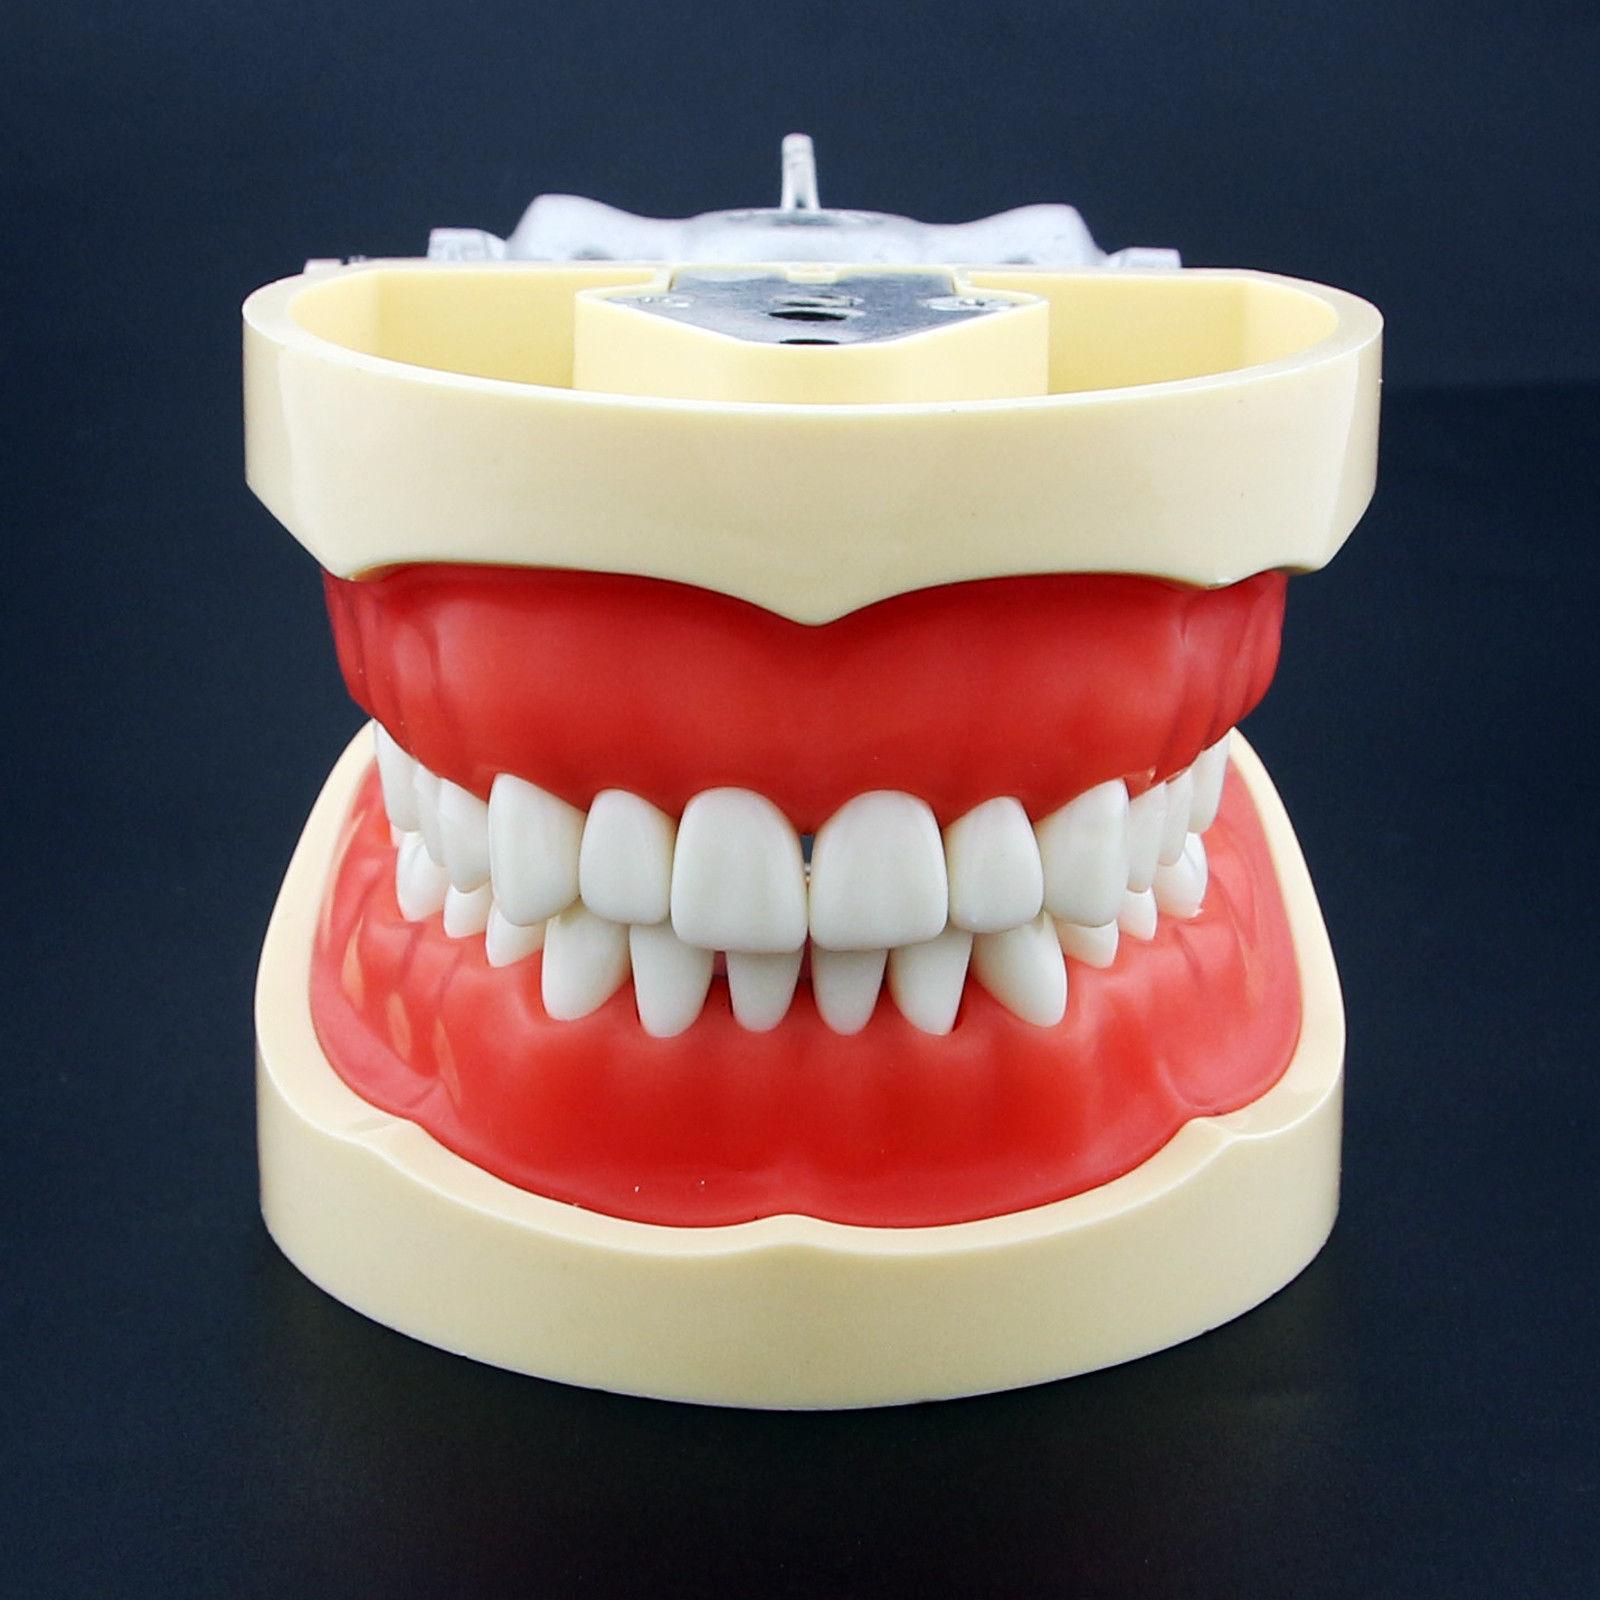 Kilgore nissin tipo dental typodon modelo 200 com dentes removíveis